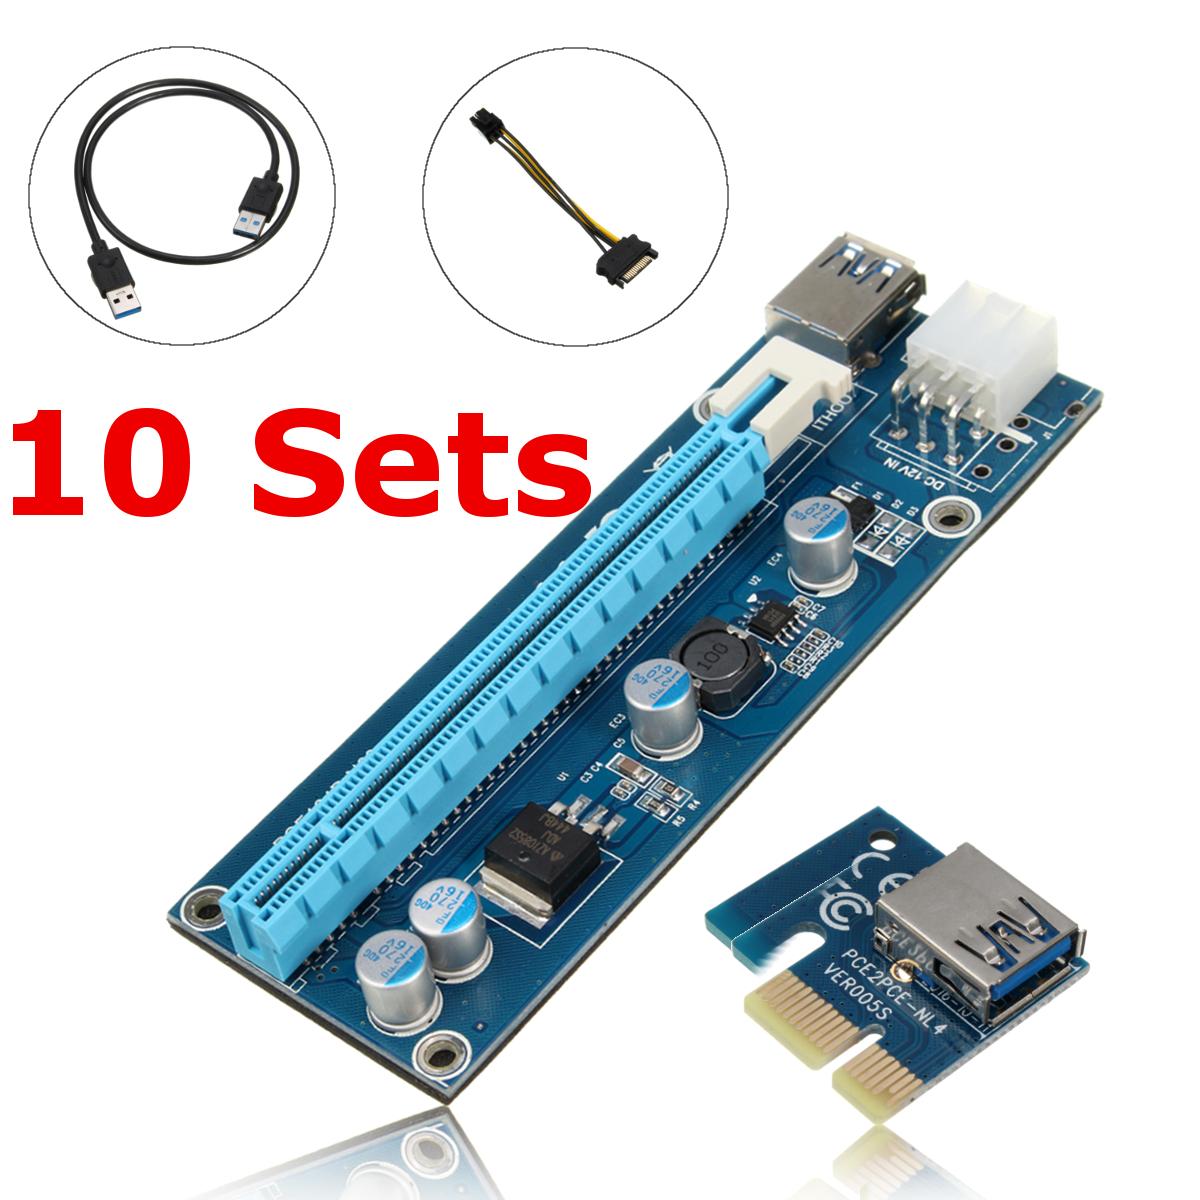 10PCS USB 3.0 PCI-E 1x to 16x Extender Riser Card SATA Ad...